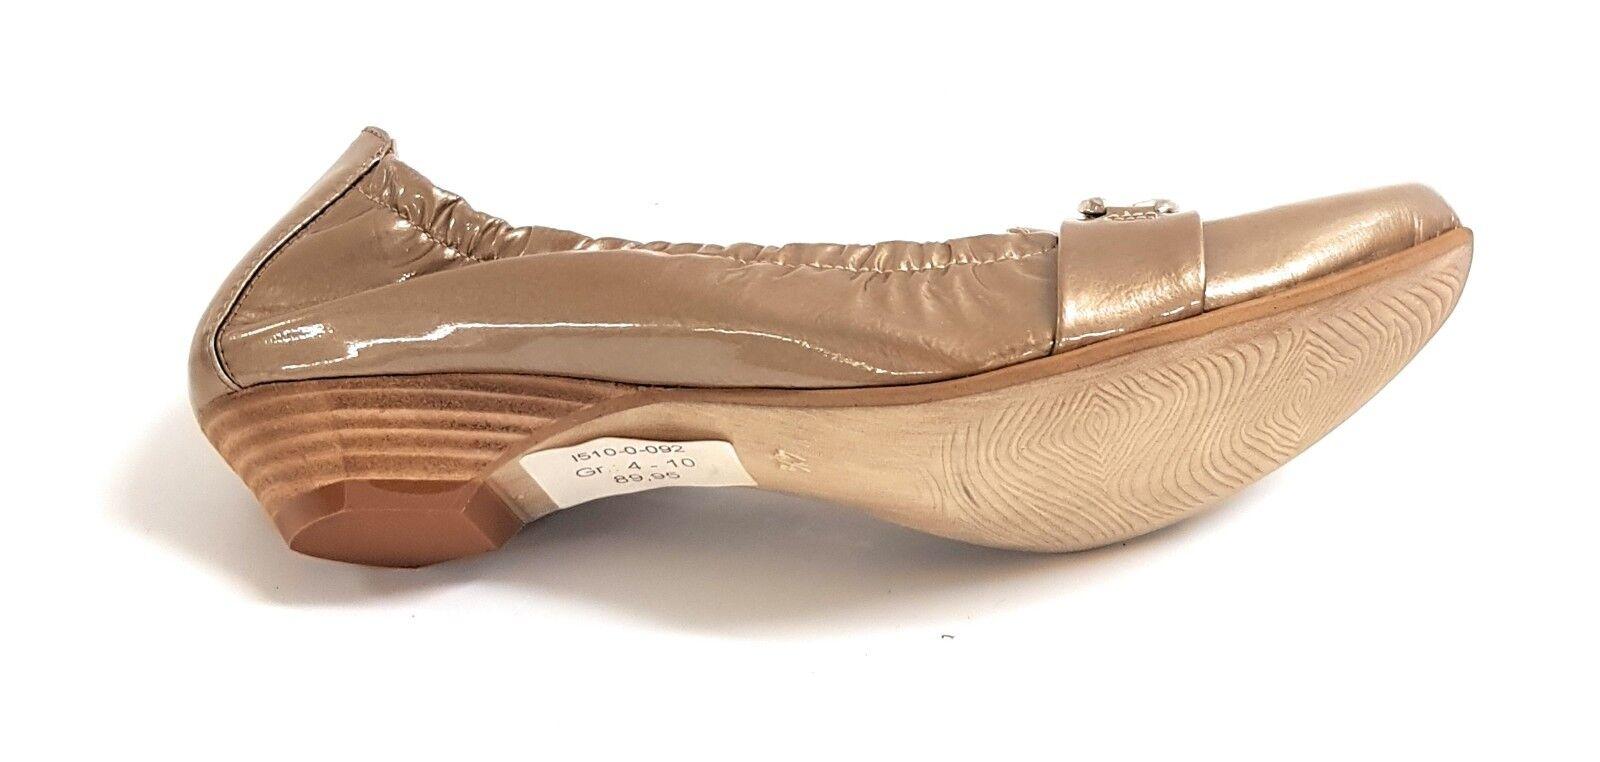 Semler Select Isa Damen Schuhe Schuhe Schuhe Slipper Ballerinas Mokassin Profilsohle LM-Absatz 0e6f71